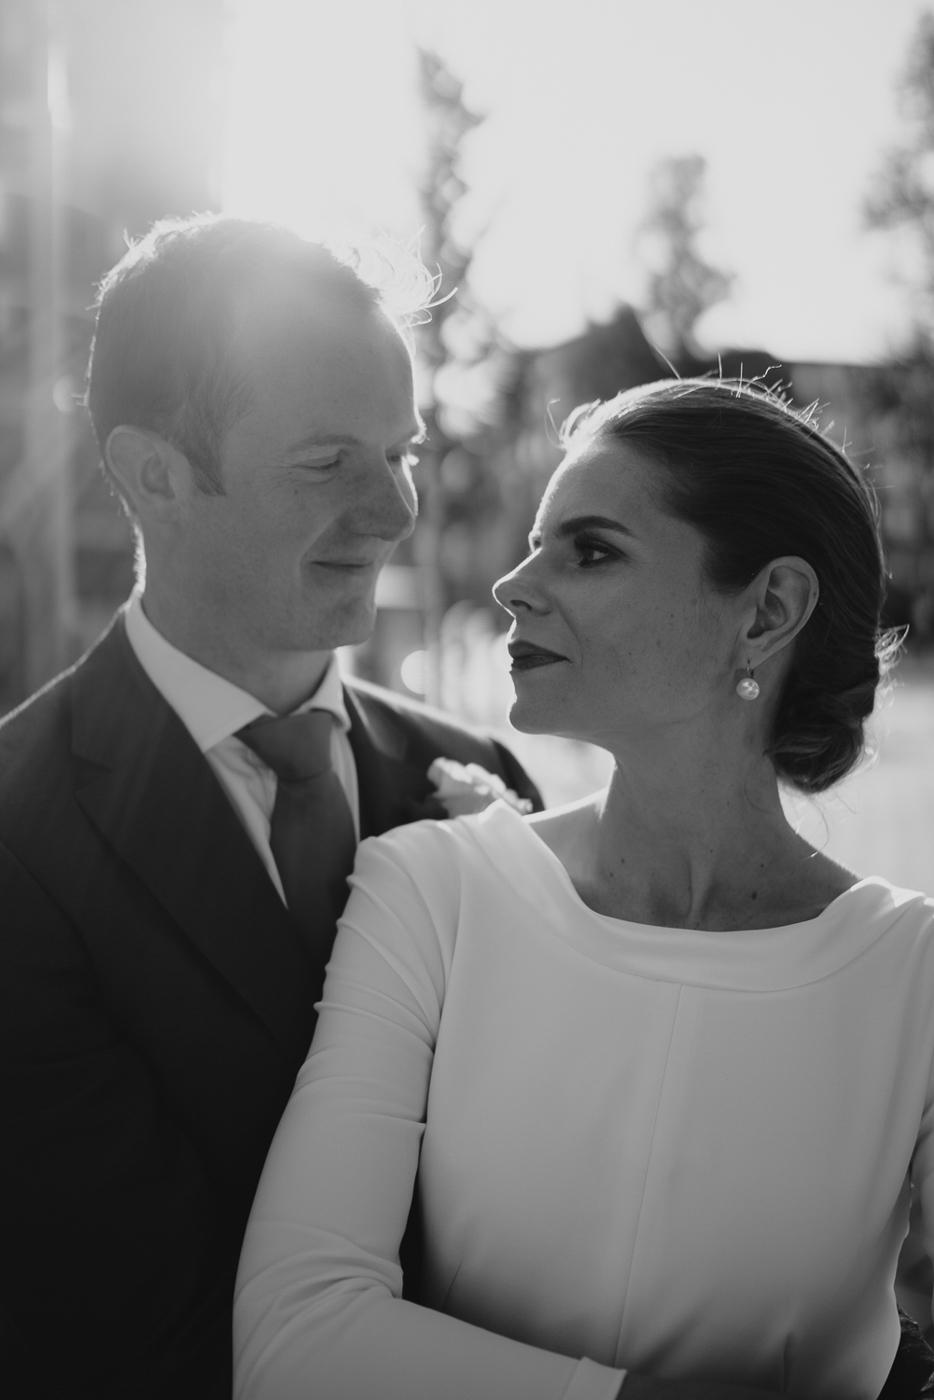 bruidsfotografie-trouwfotograaf-wedding-photographer-amsterdam-James-Jantine-291-1.jpg